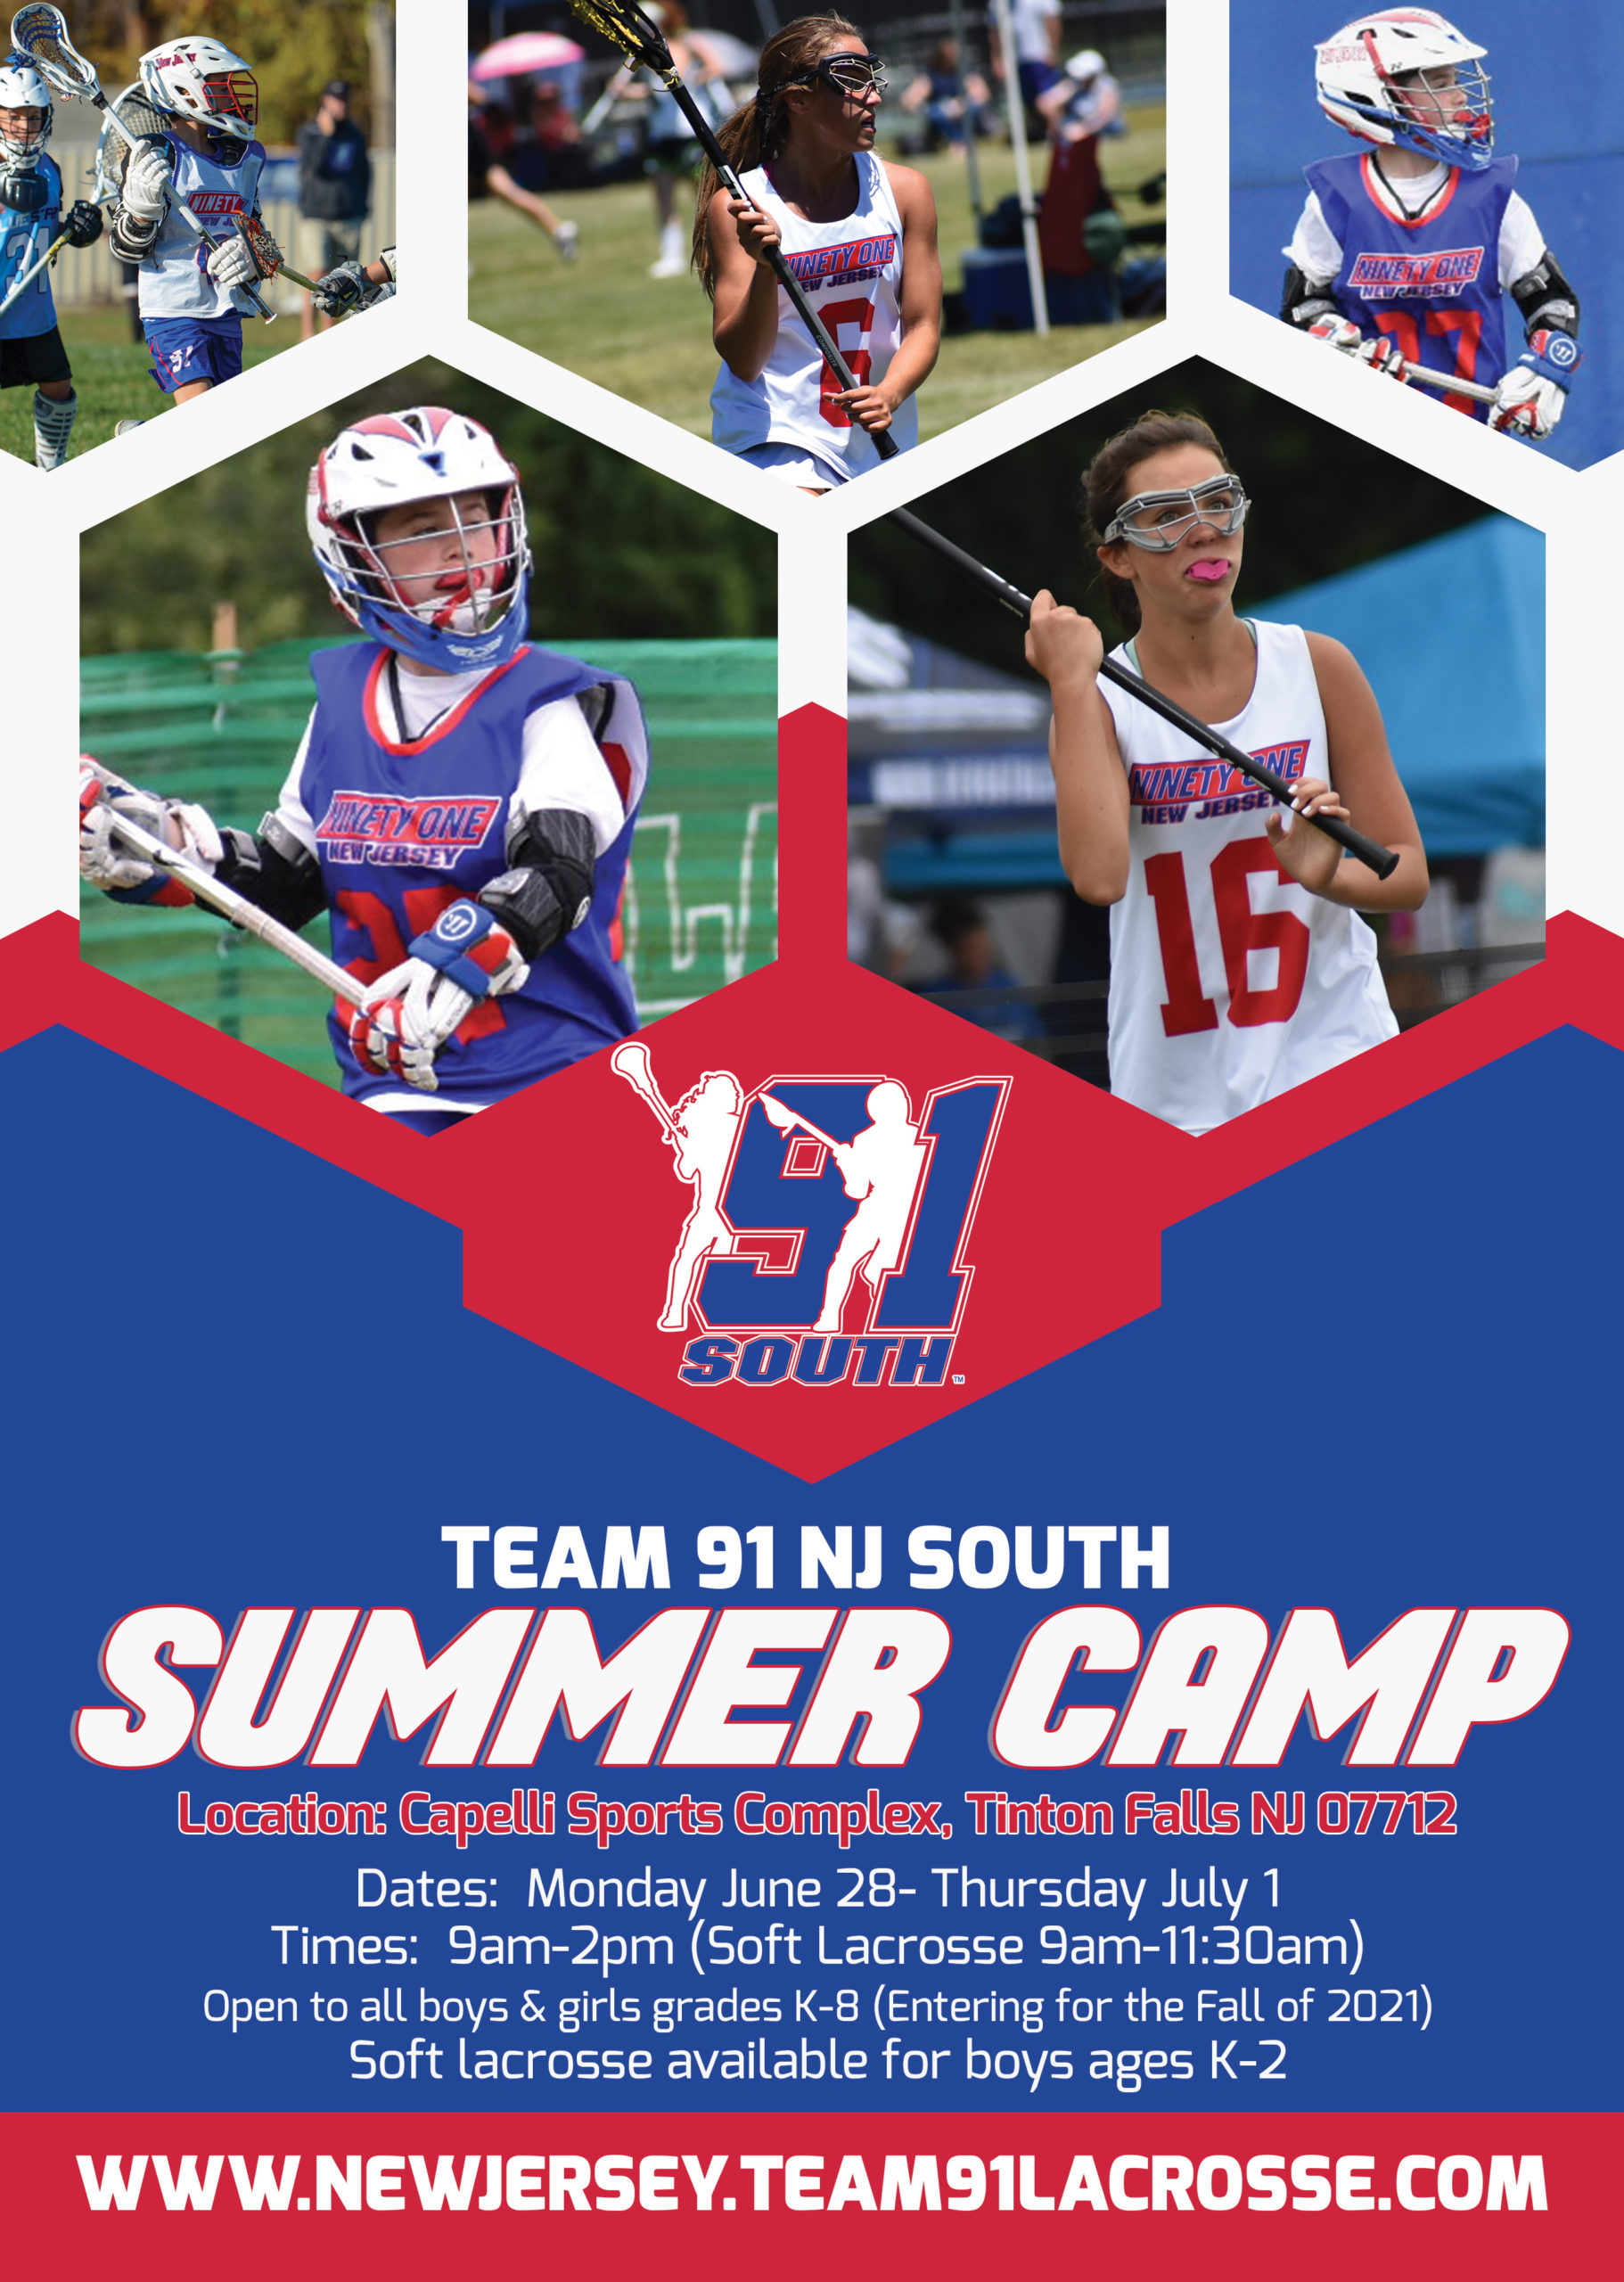 2021-Team91NJSouth-SummerCamp_BoysGirls